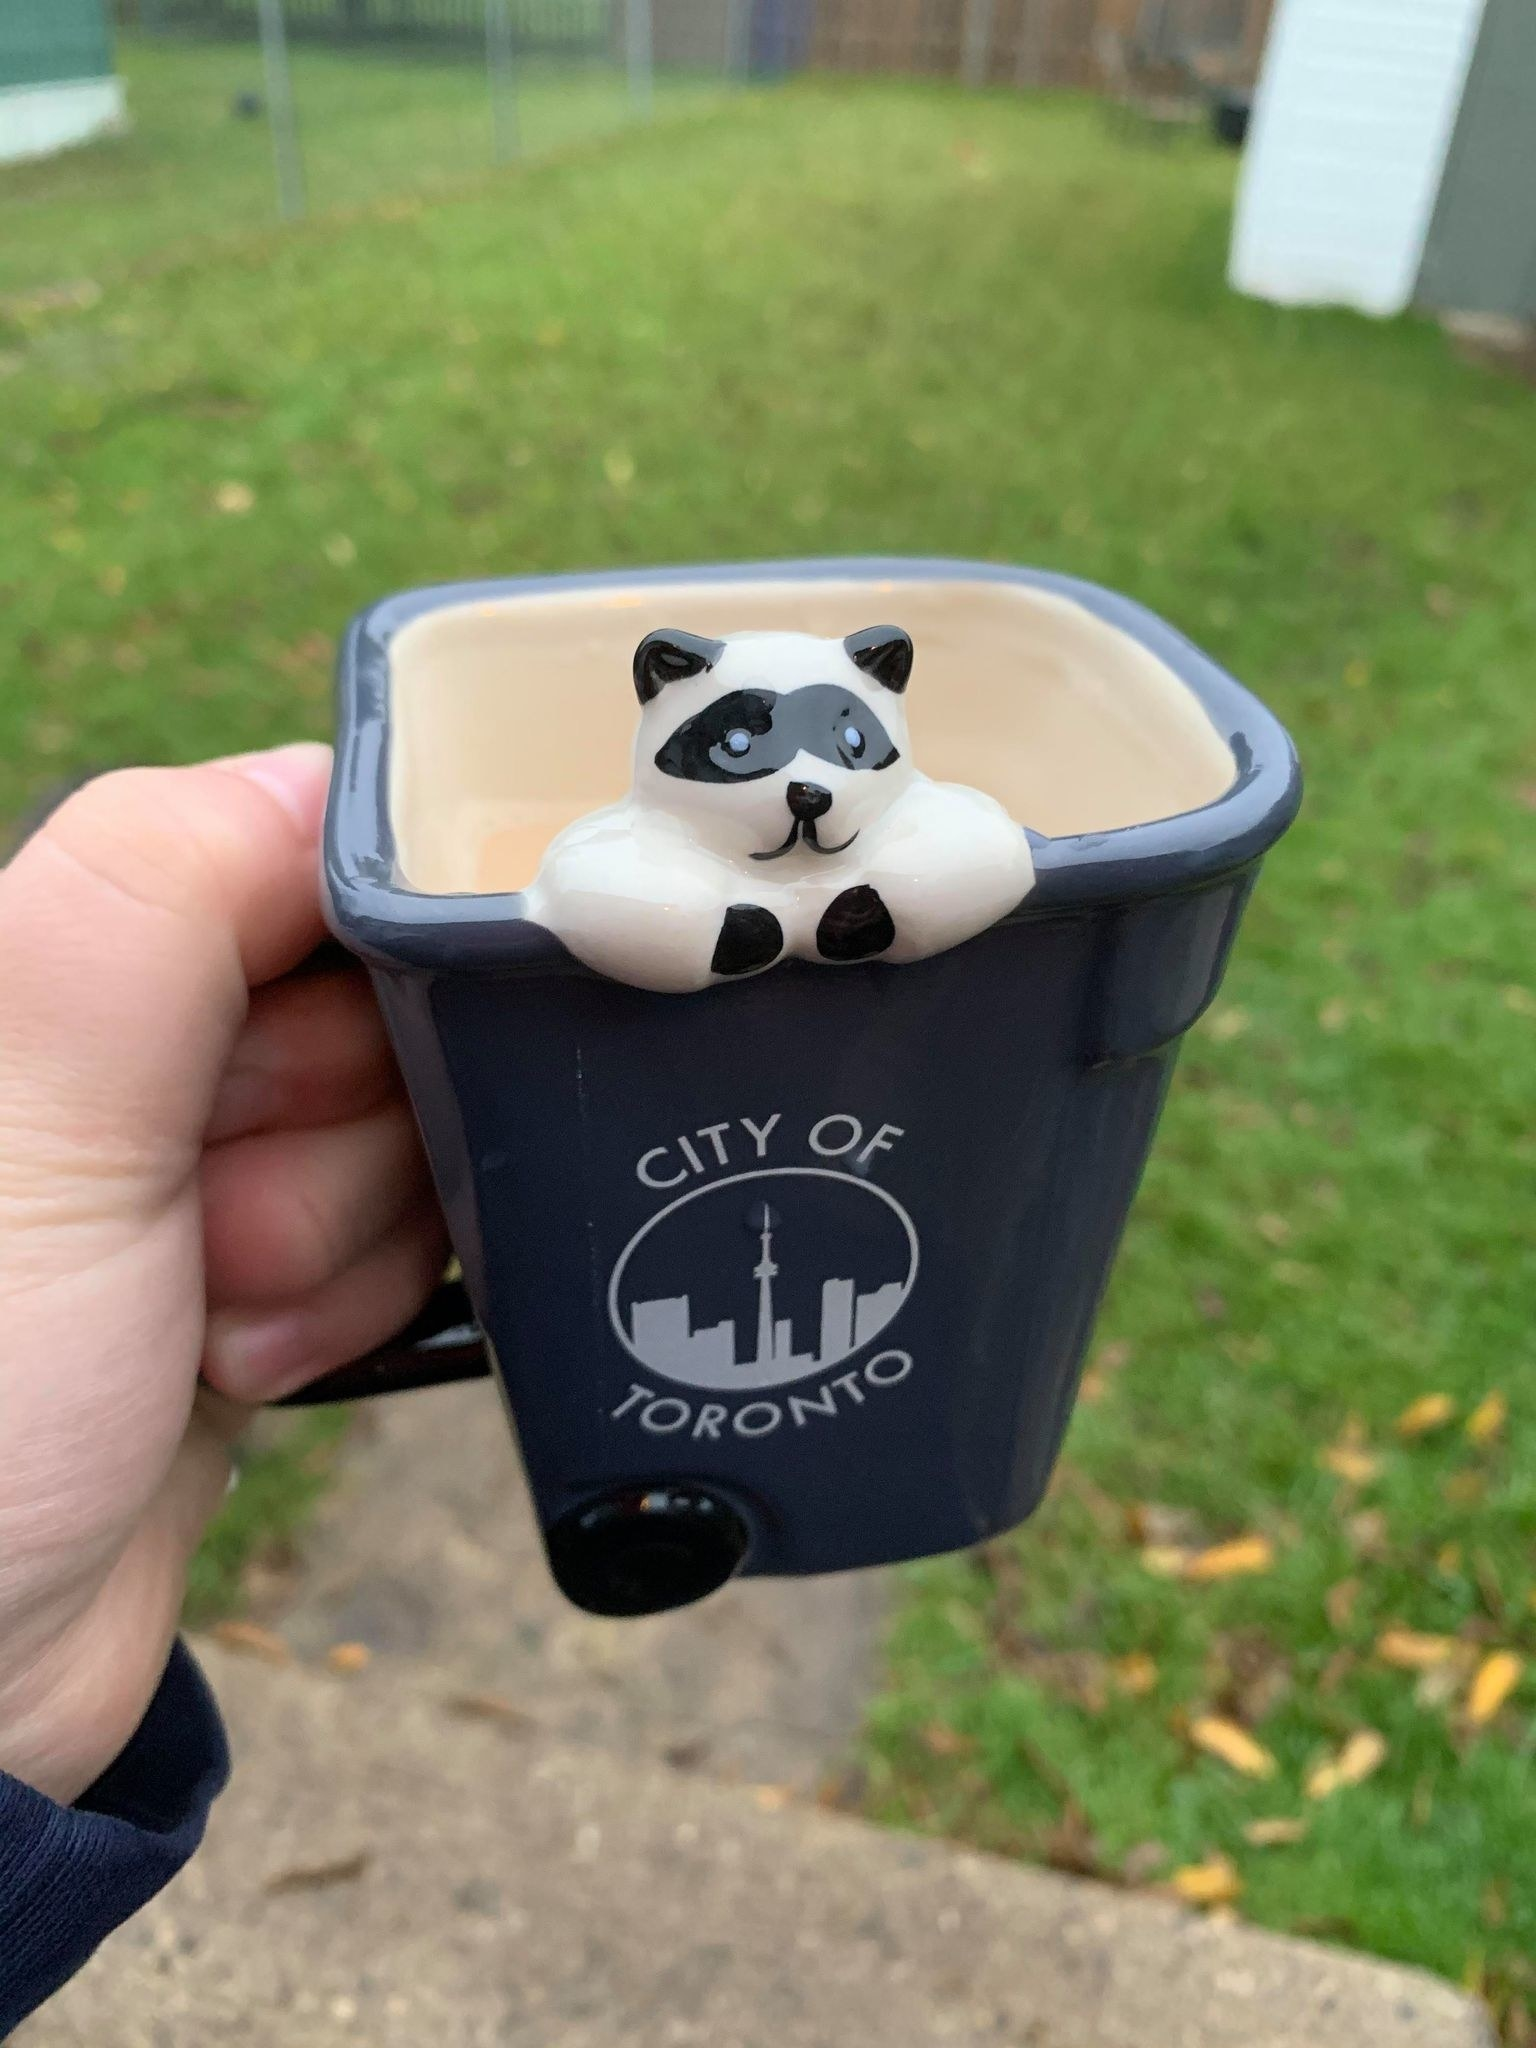 A hand holding a mug shaped like a Toronto garbage bin with a raccoon poking out